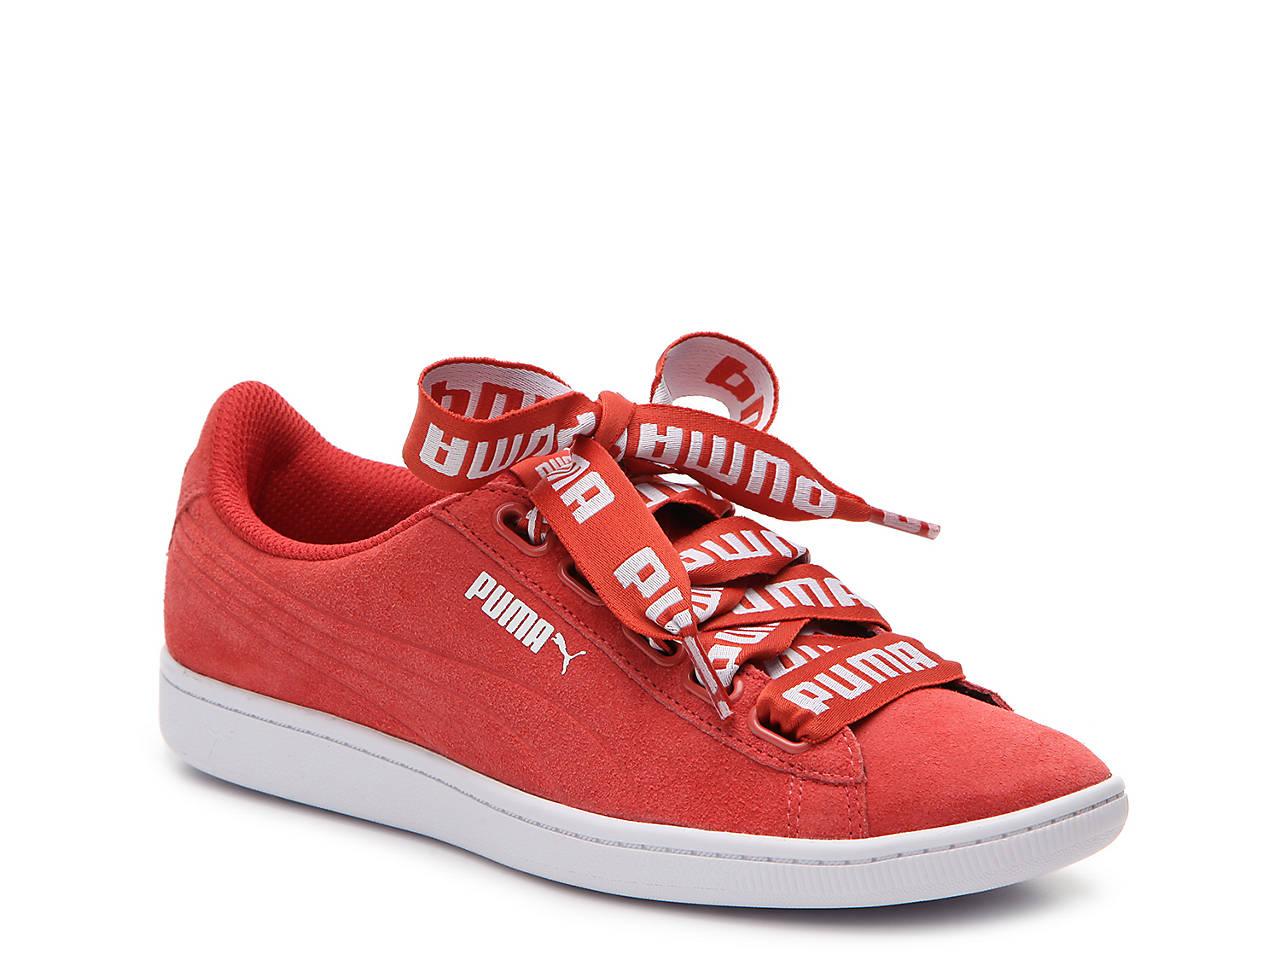 5750ba6dc6be Puma Vikky Ribbon Bold Sneaker - Women s Women s Shoes